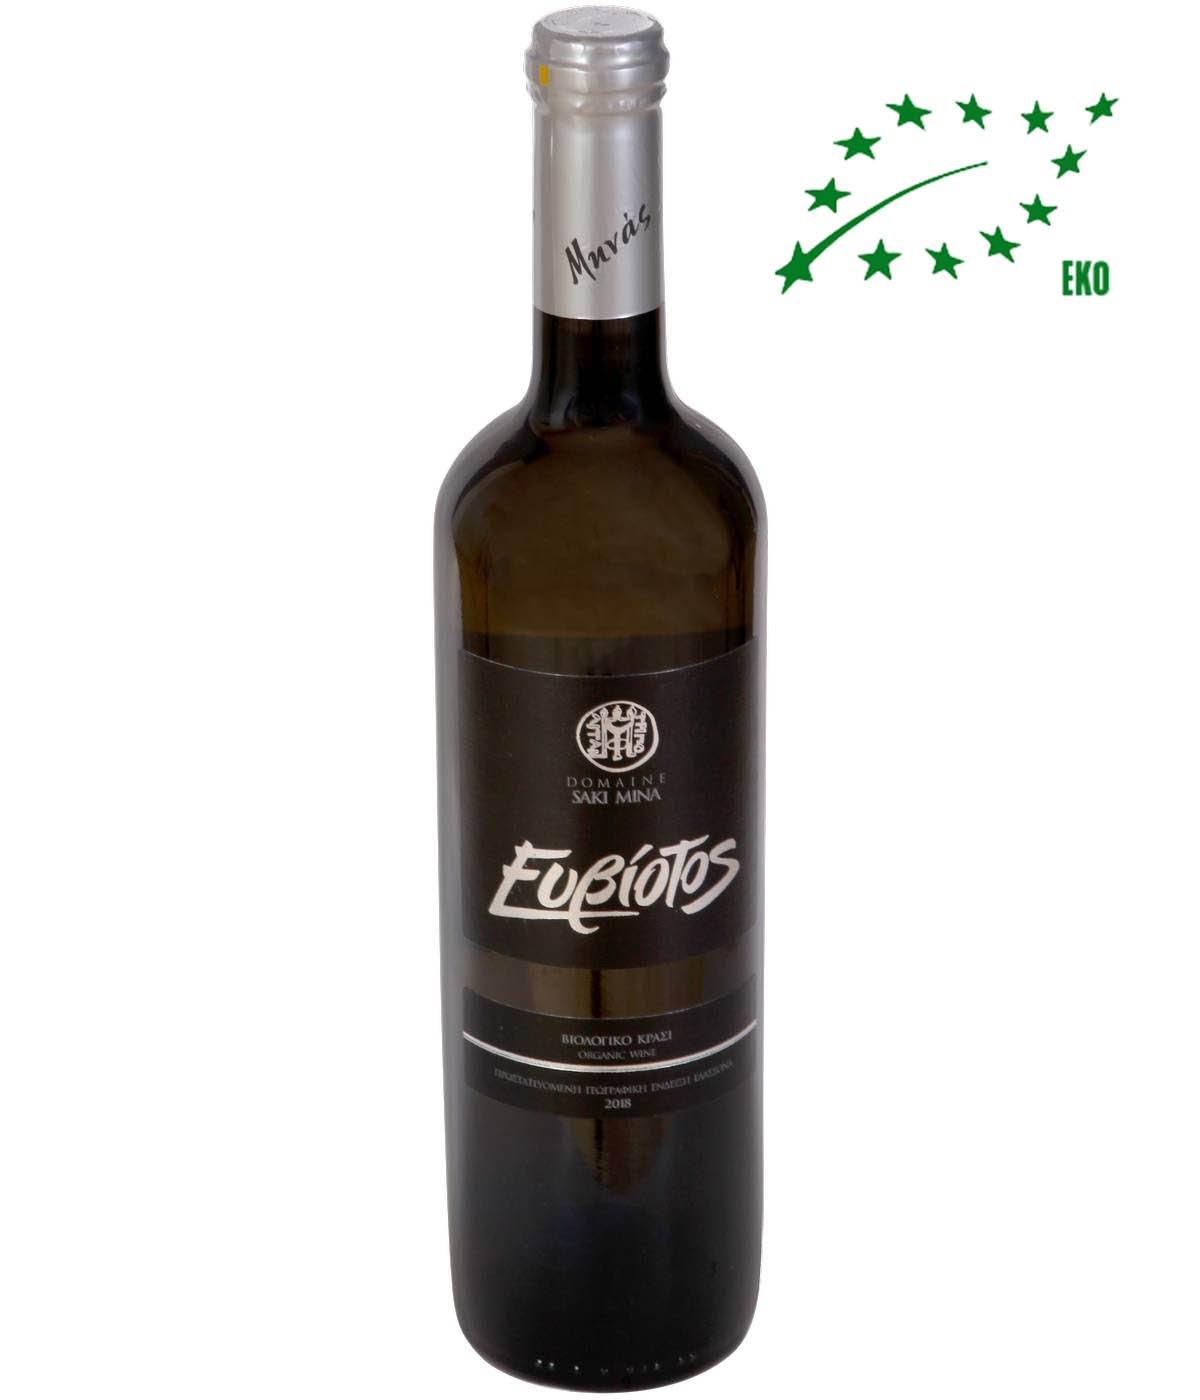 Eviotos Sauvignon Blanc Eko 750 ml Vitt Vin